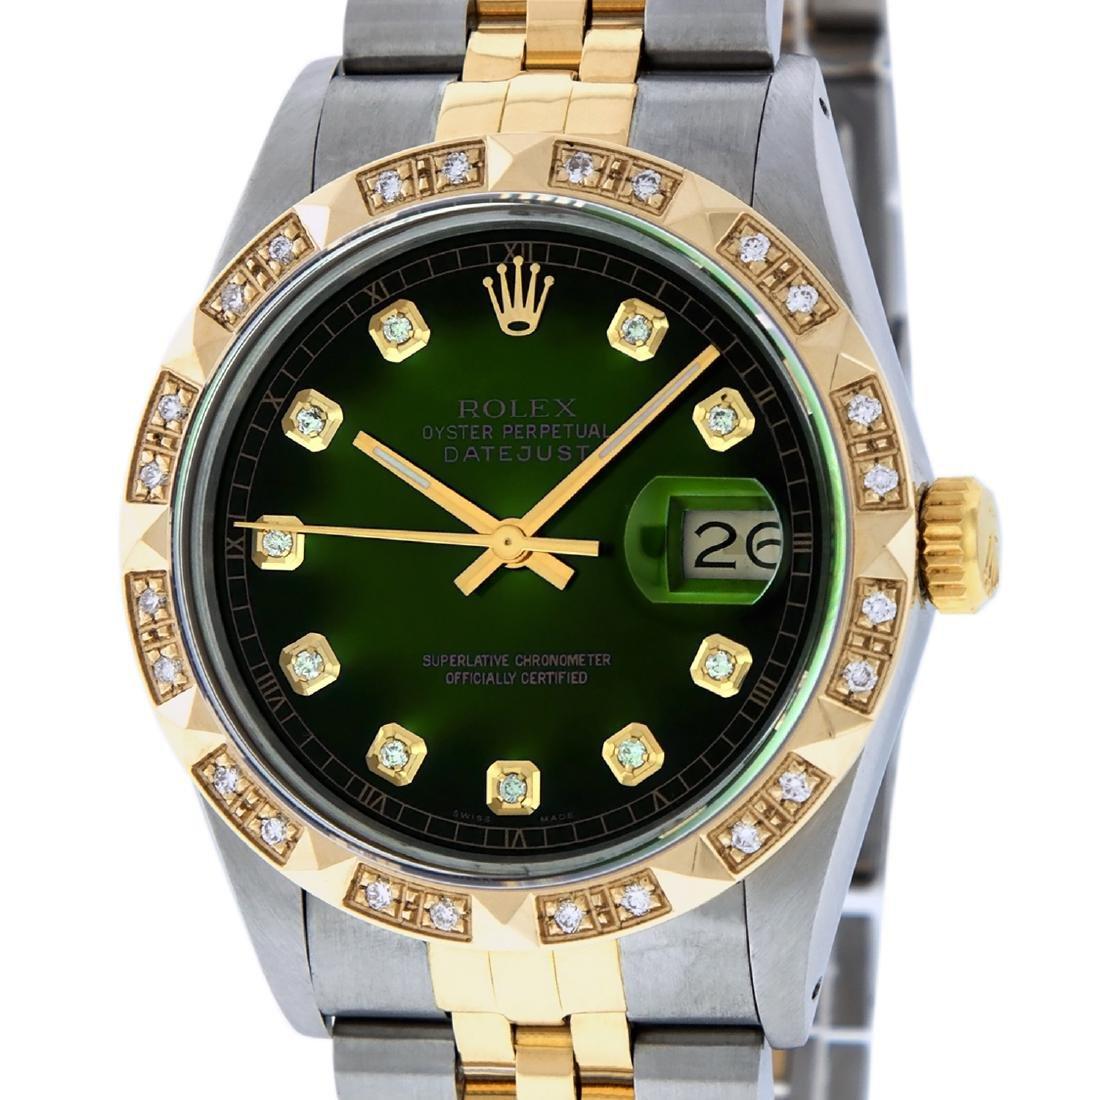 Rolex Mens Datejust 16013 Watch SS/18K Yellow Gold